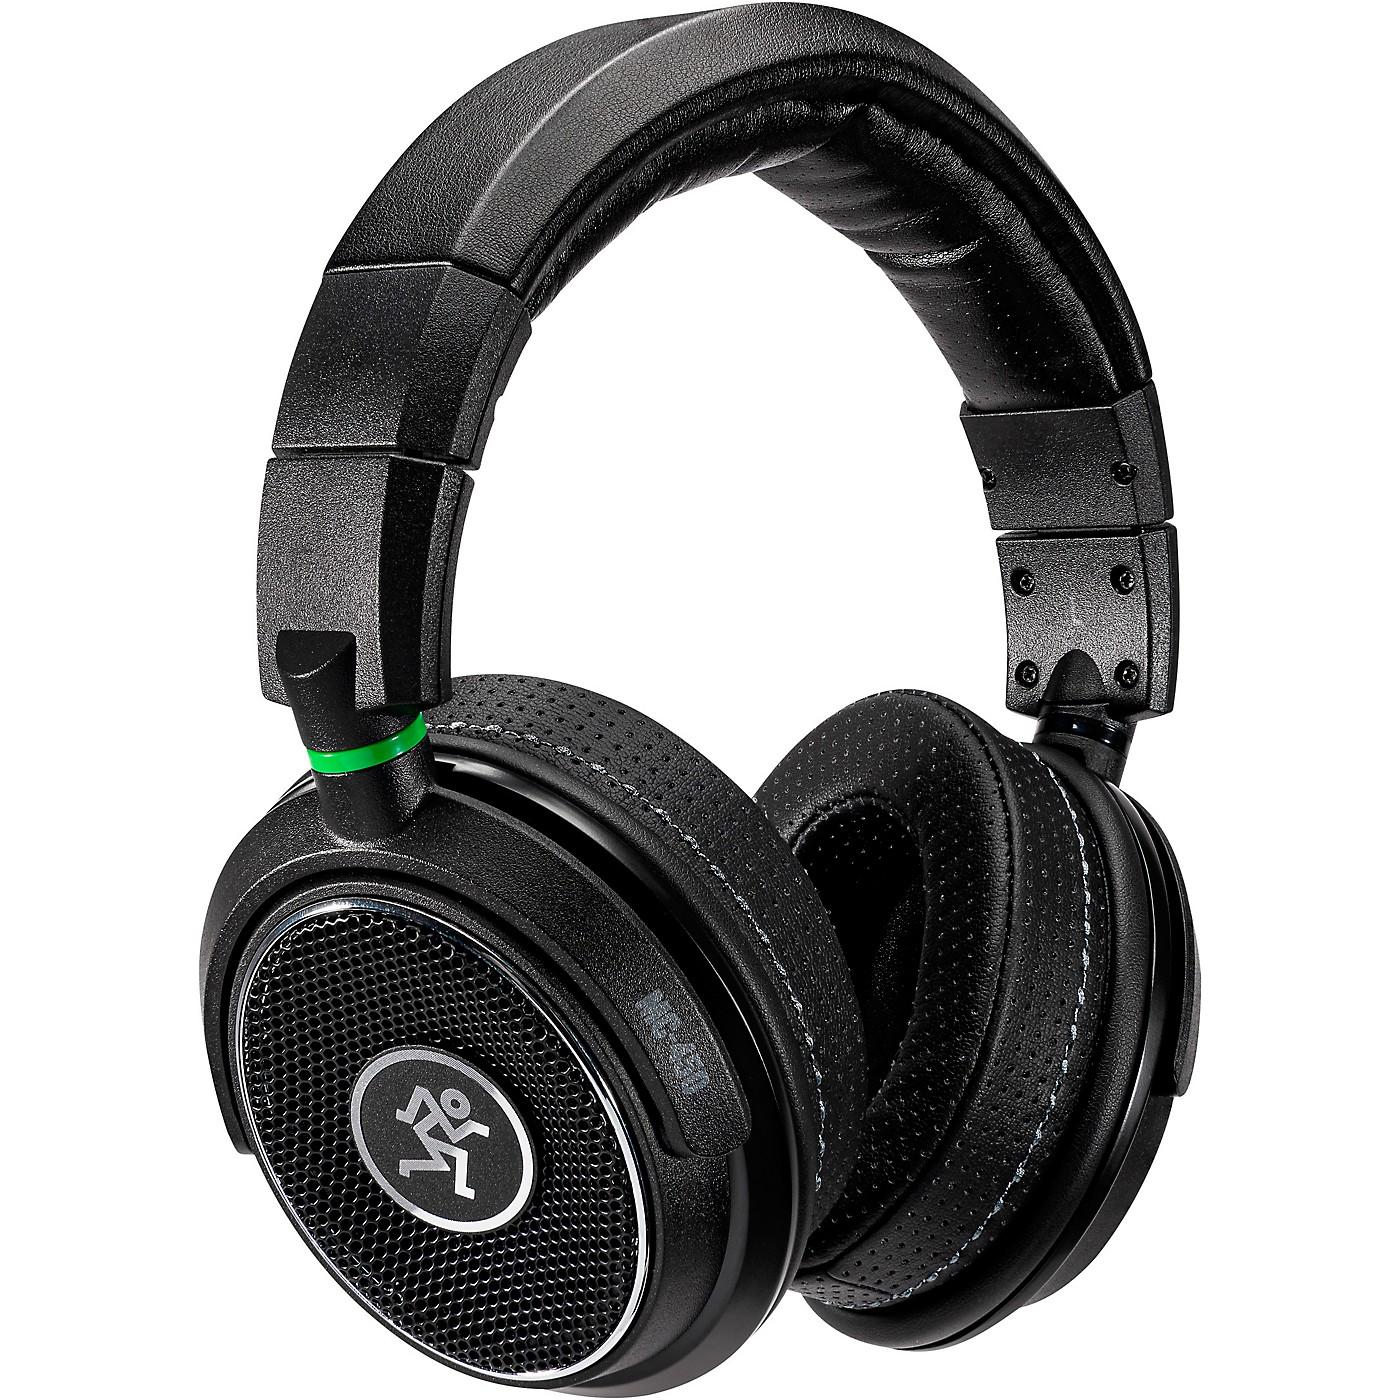 Mackie MC-450 Professional Open-Back Headphones thumbnail